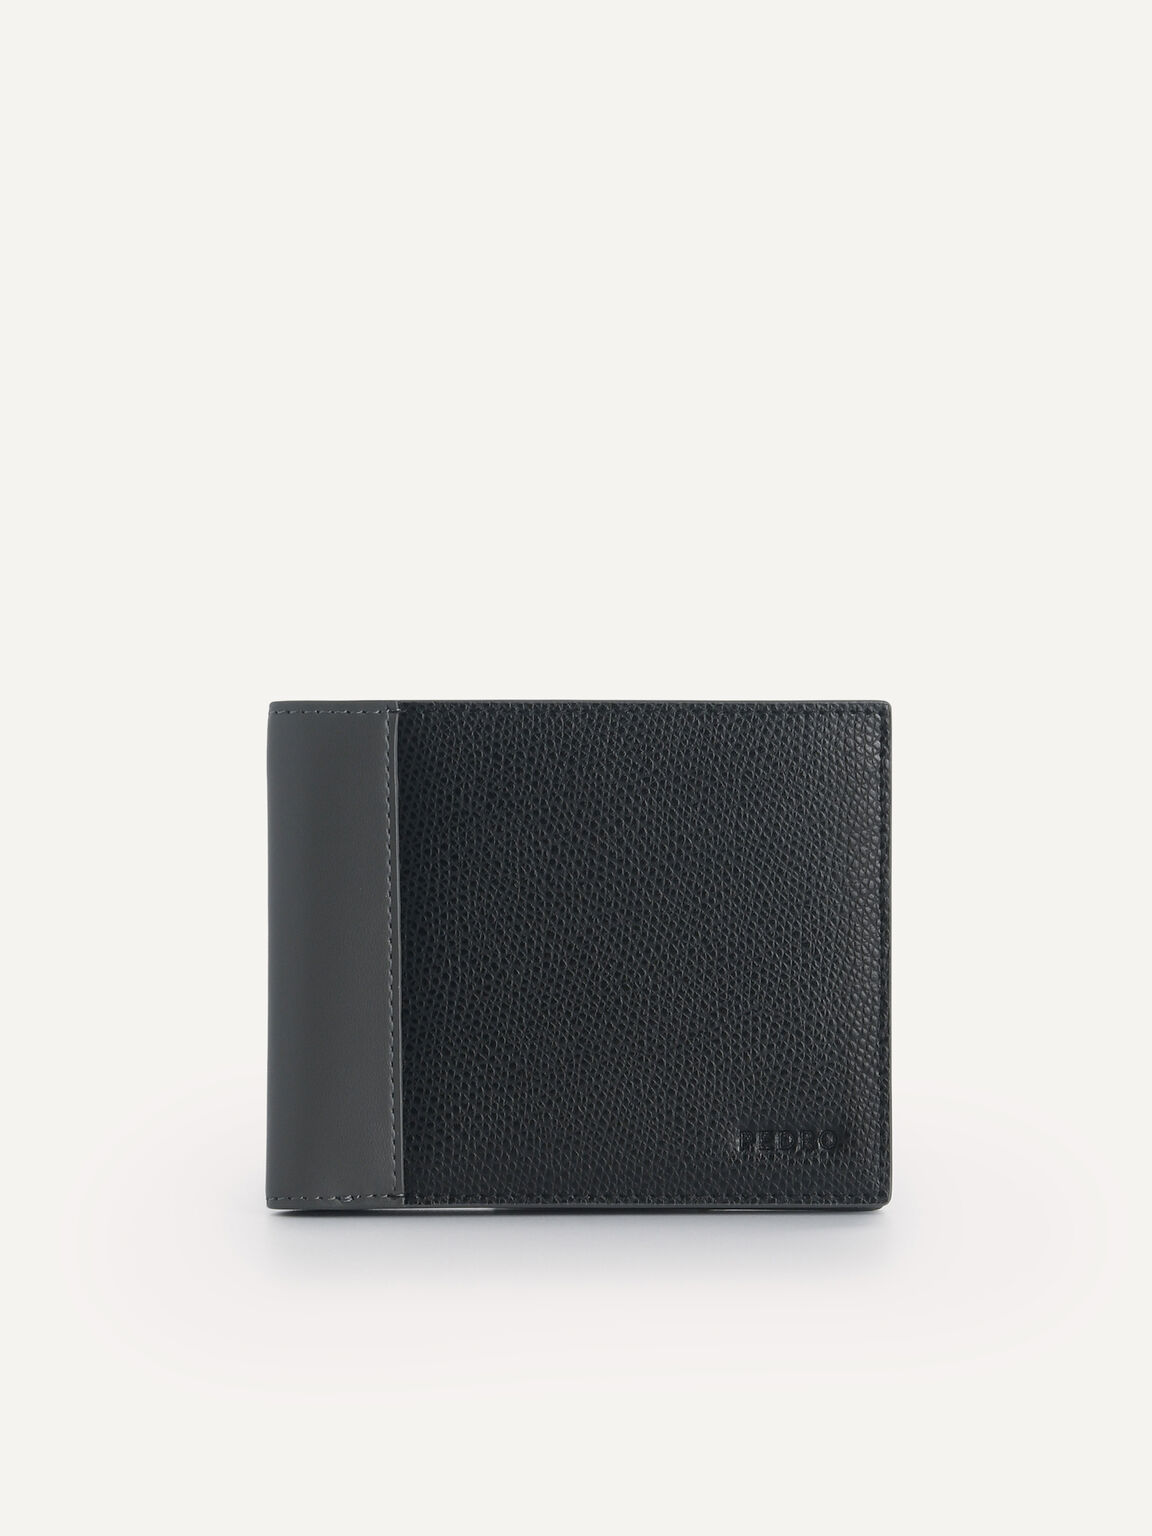 Textured Leather Bi-Fold Wallet with Flip, Black, hi-res